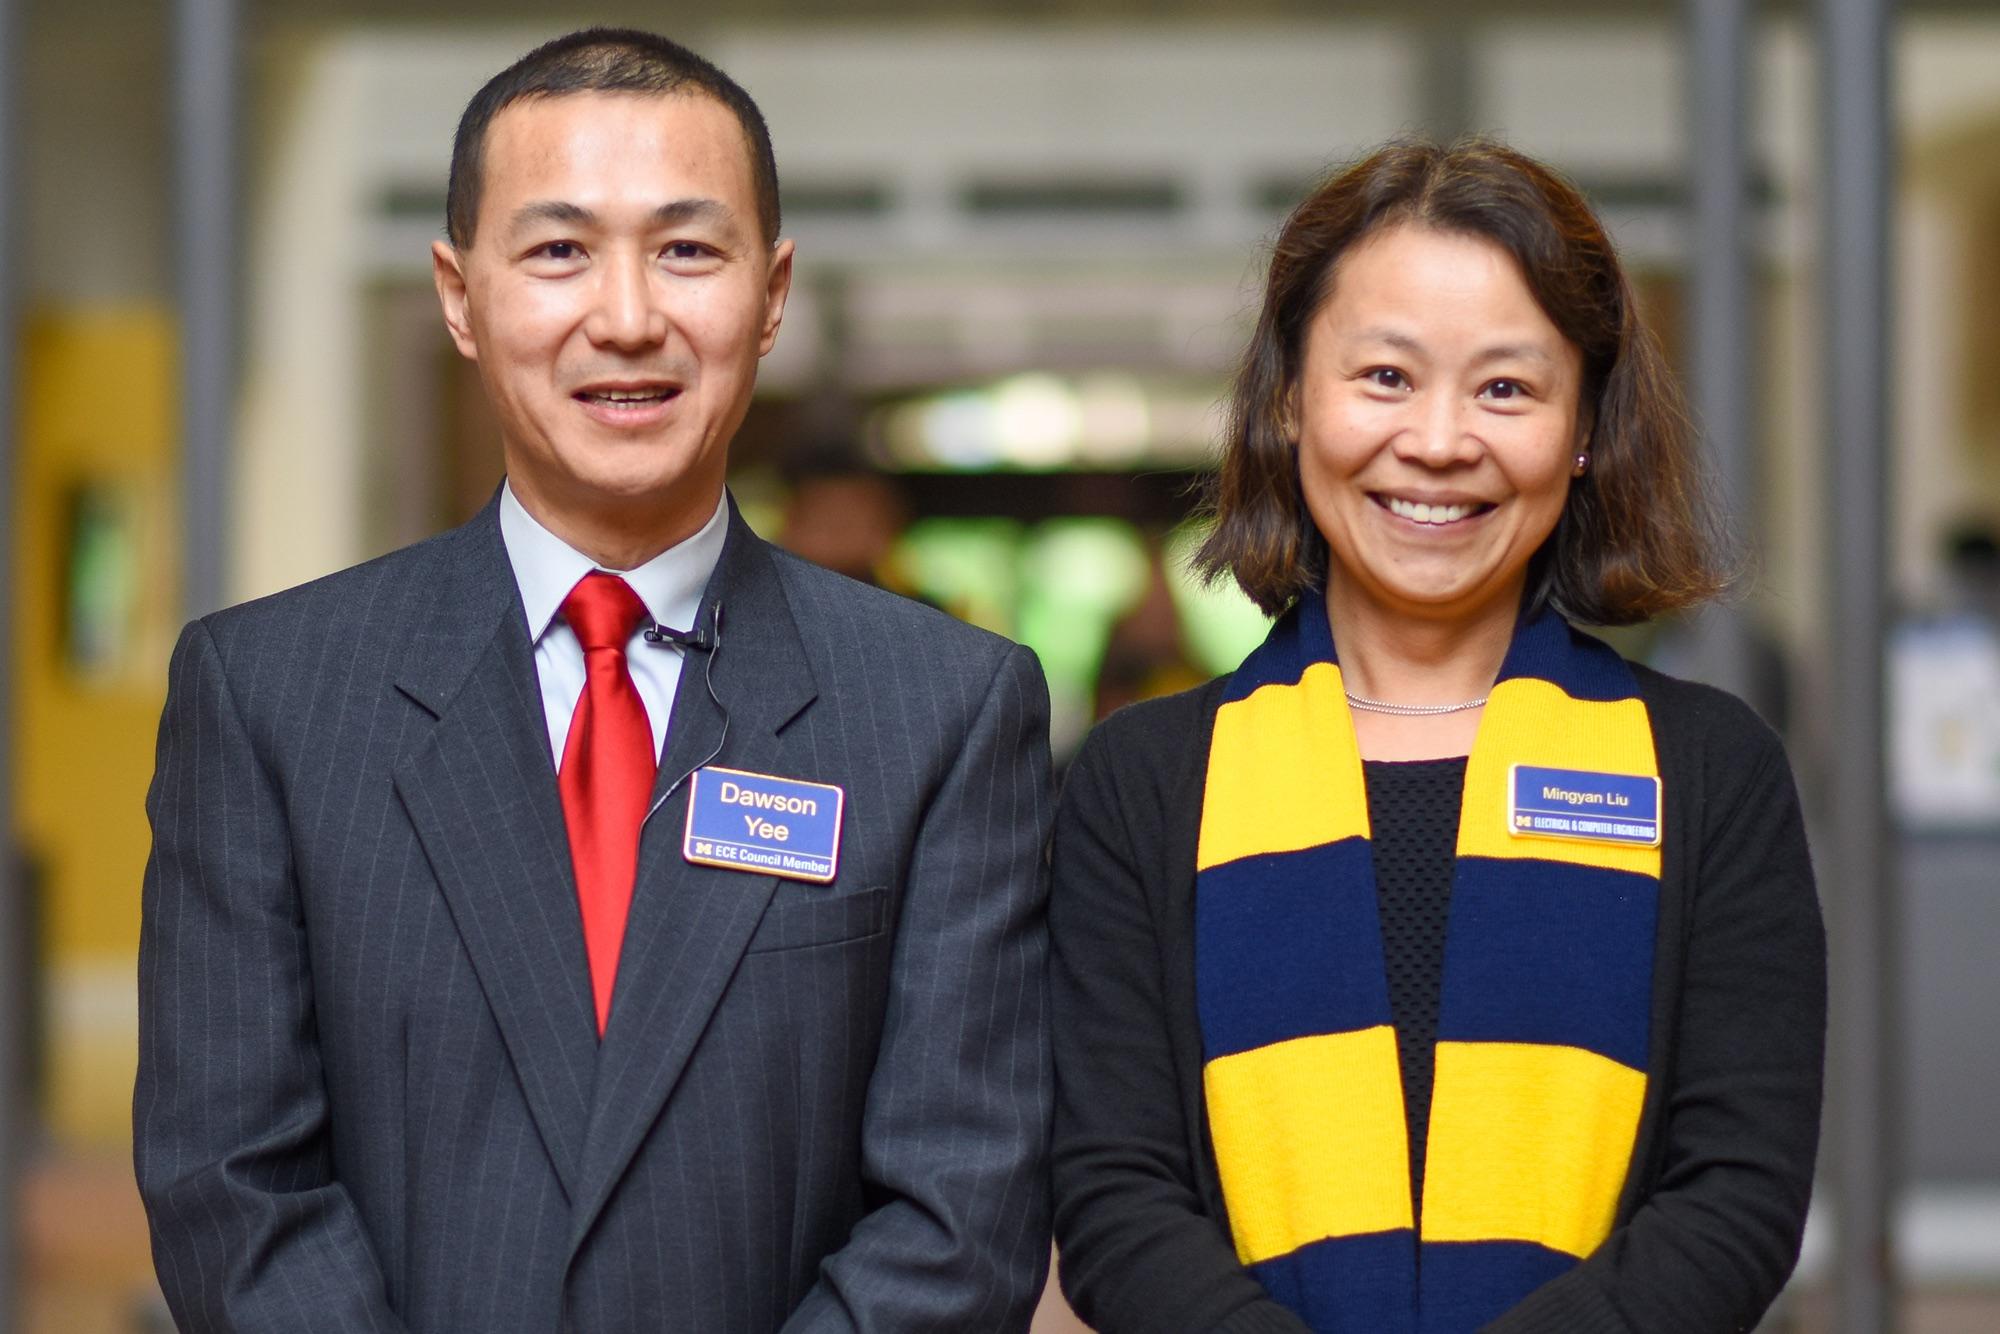 Dawson Yee and Mingyan Liu